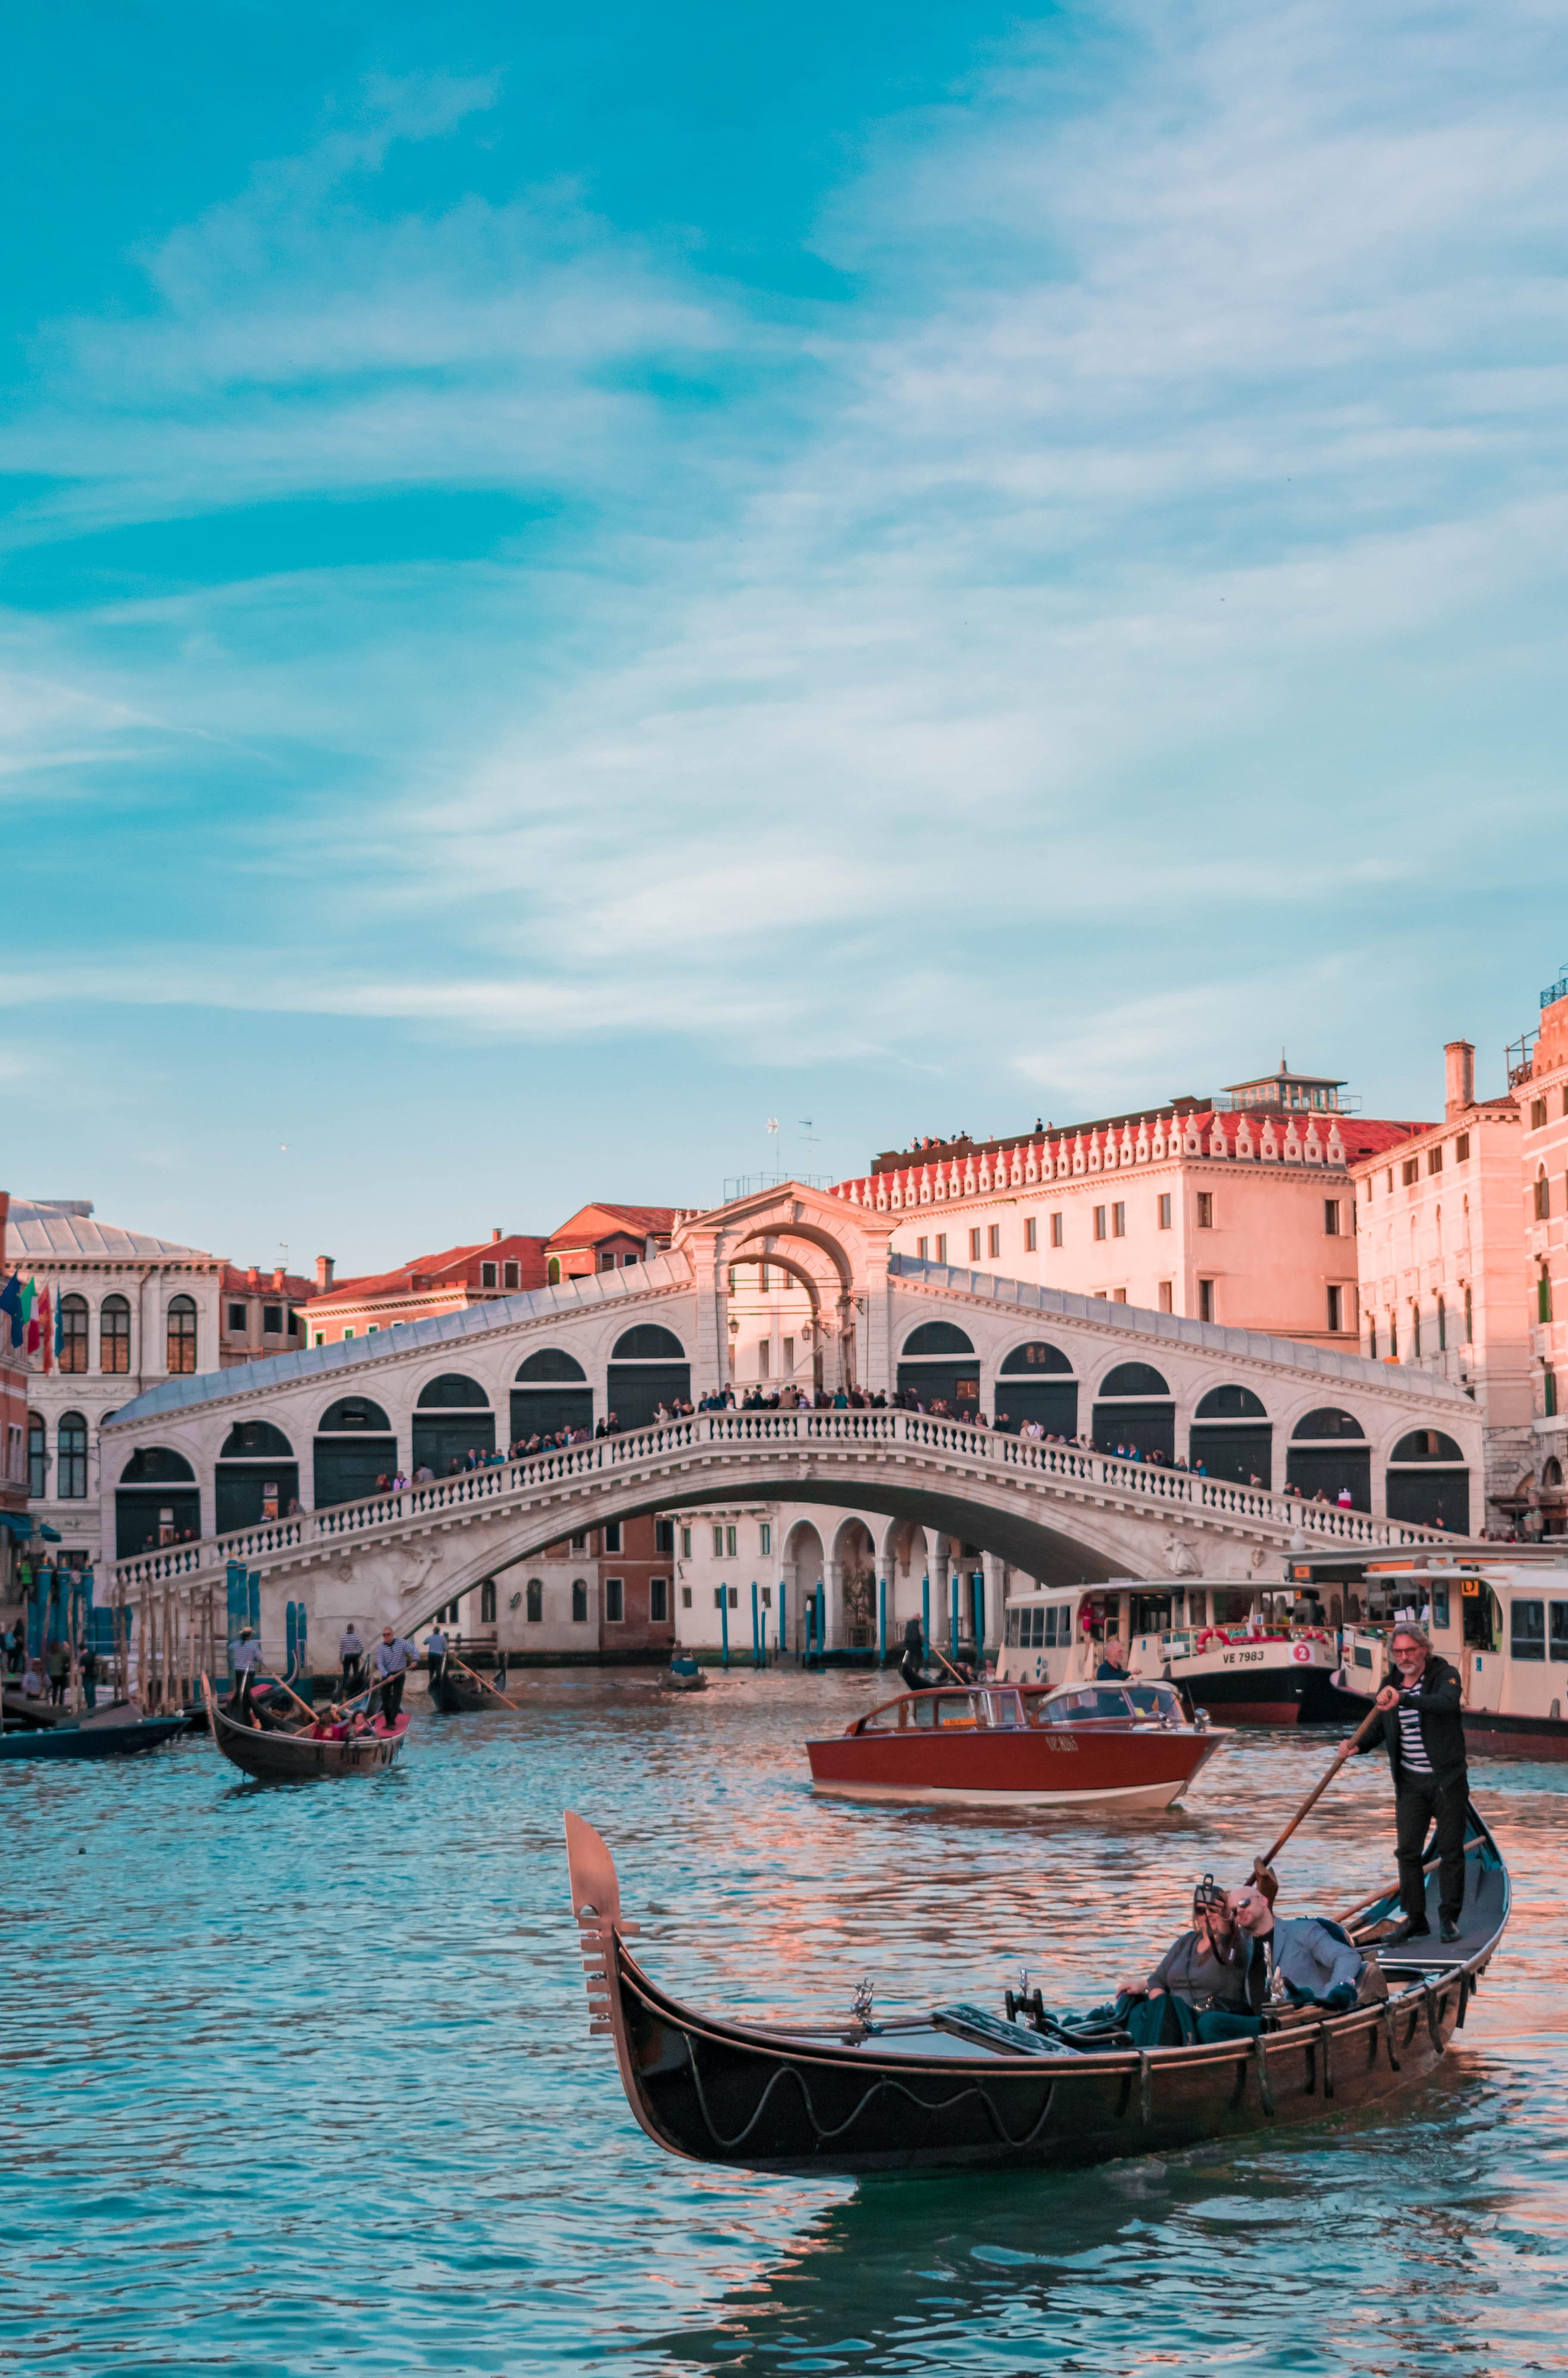 venice italy ponte rialto gondola chasing liberty